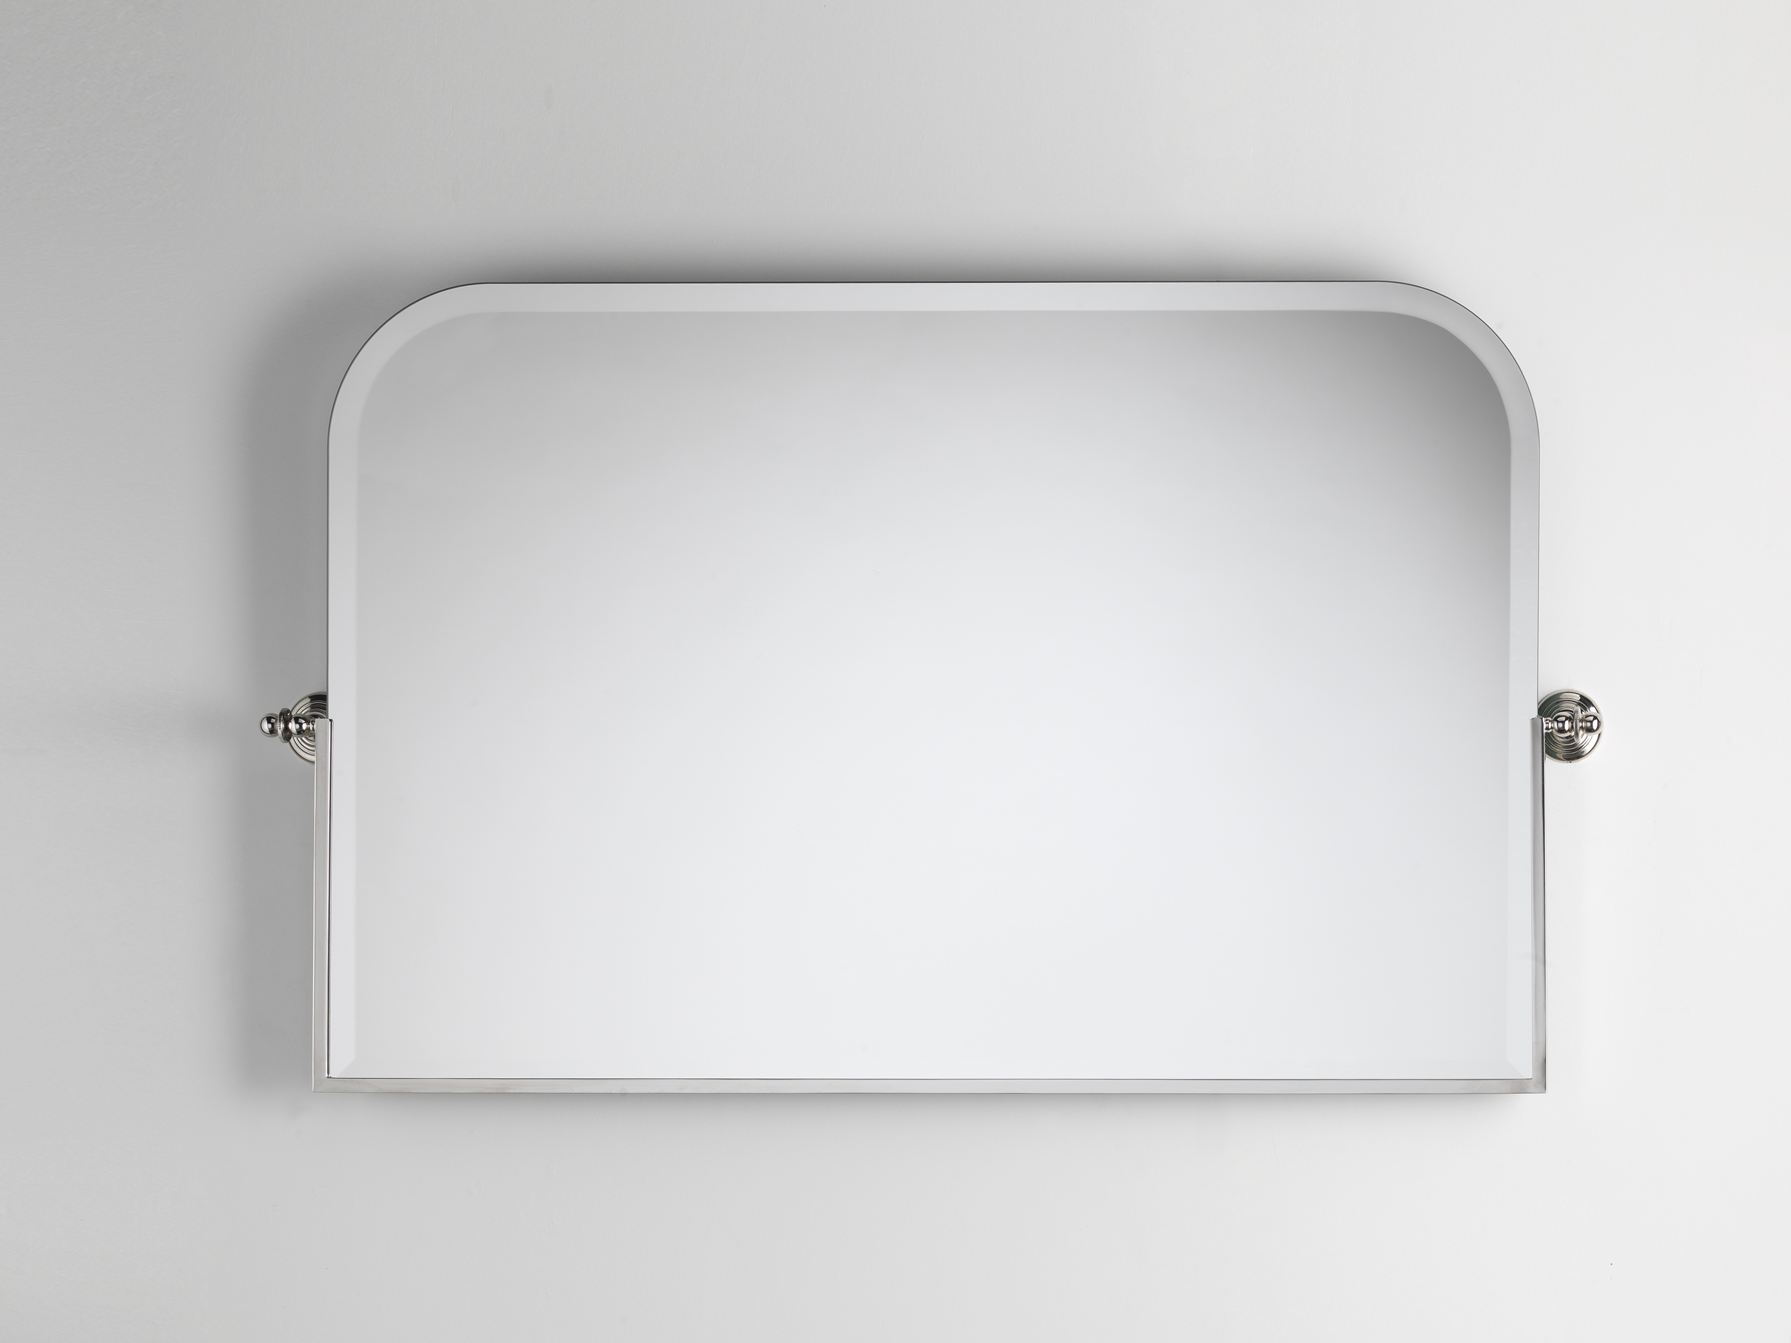 Miroir pour salle de bain gatsby 2 by devon devon for Miroir pour salle de bain